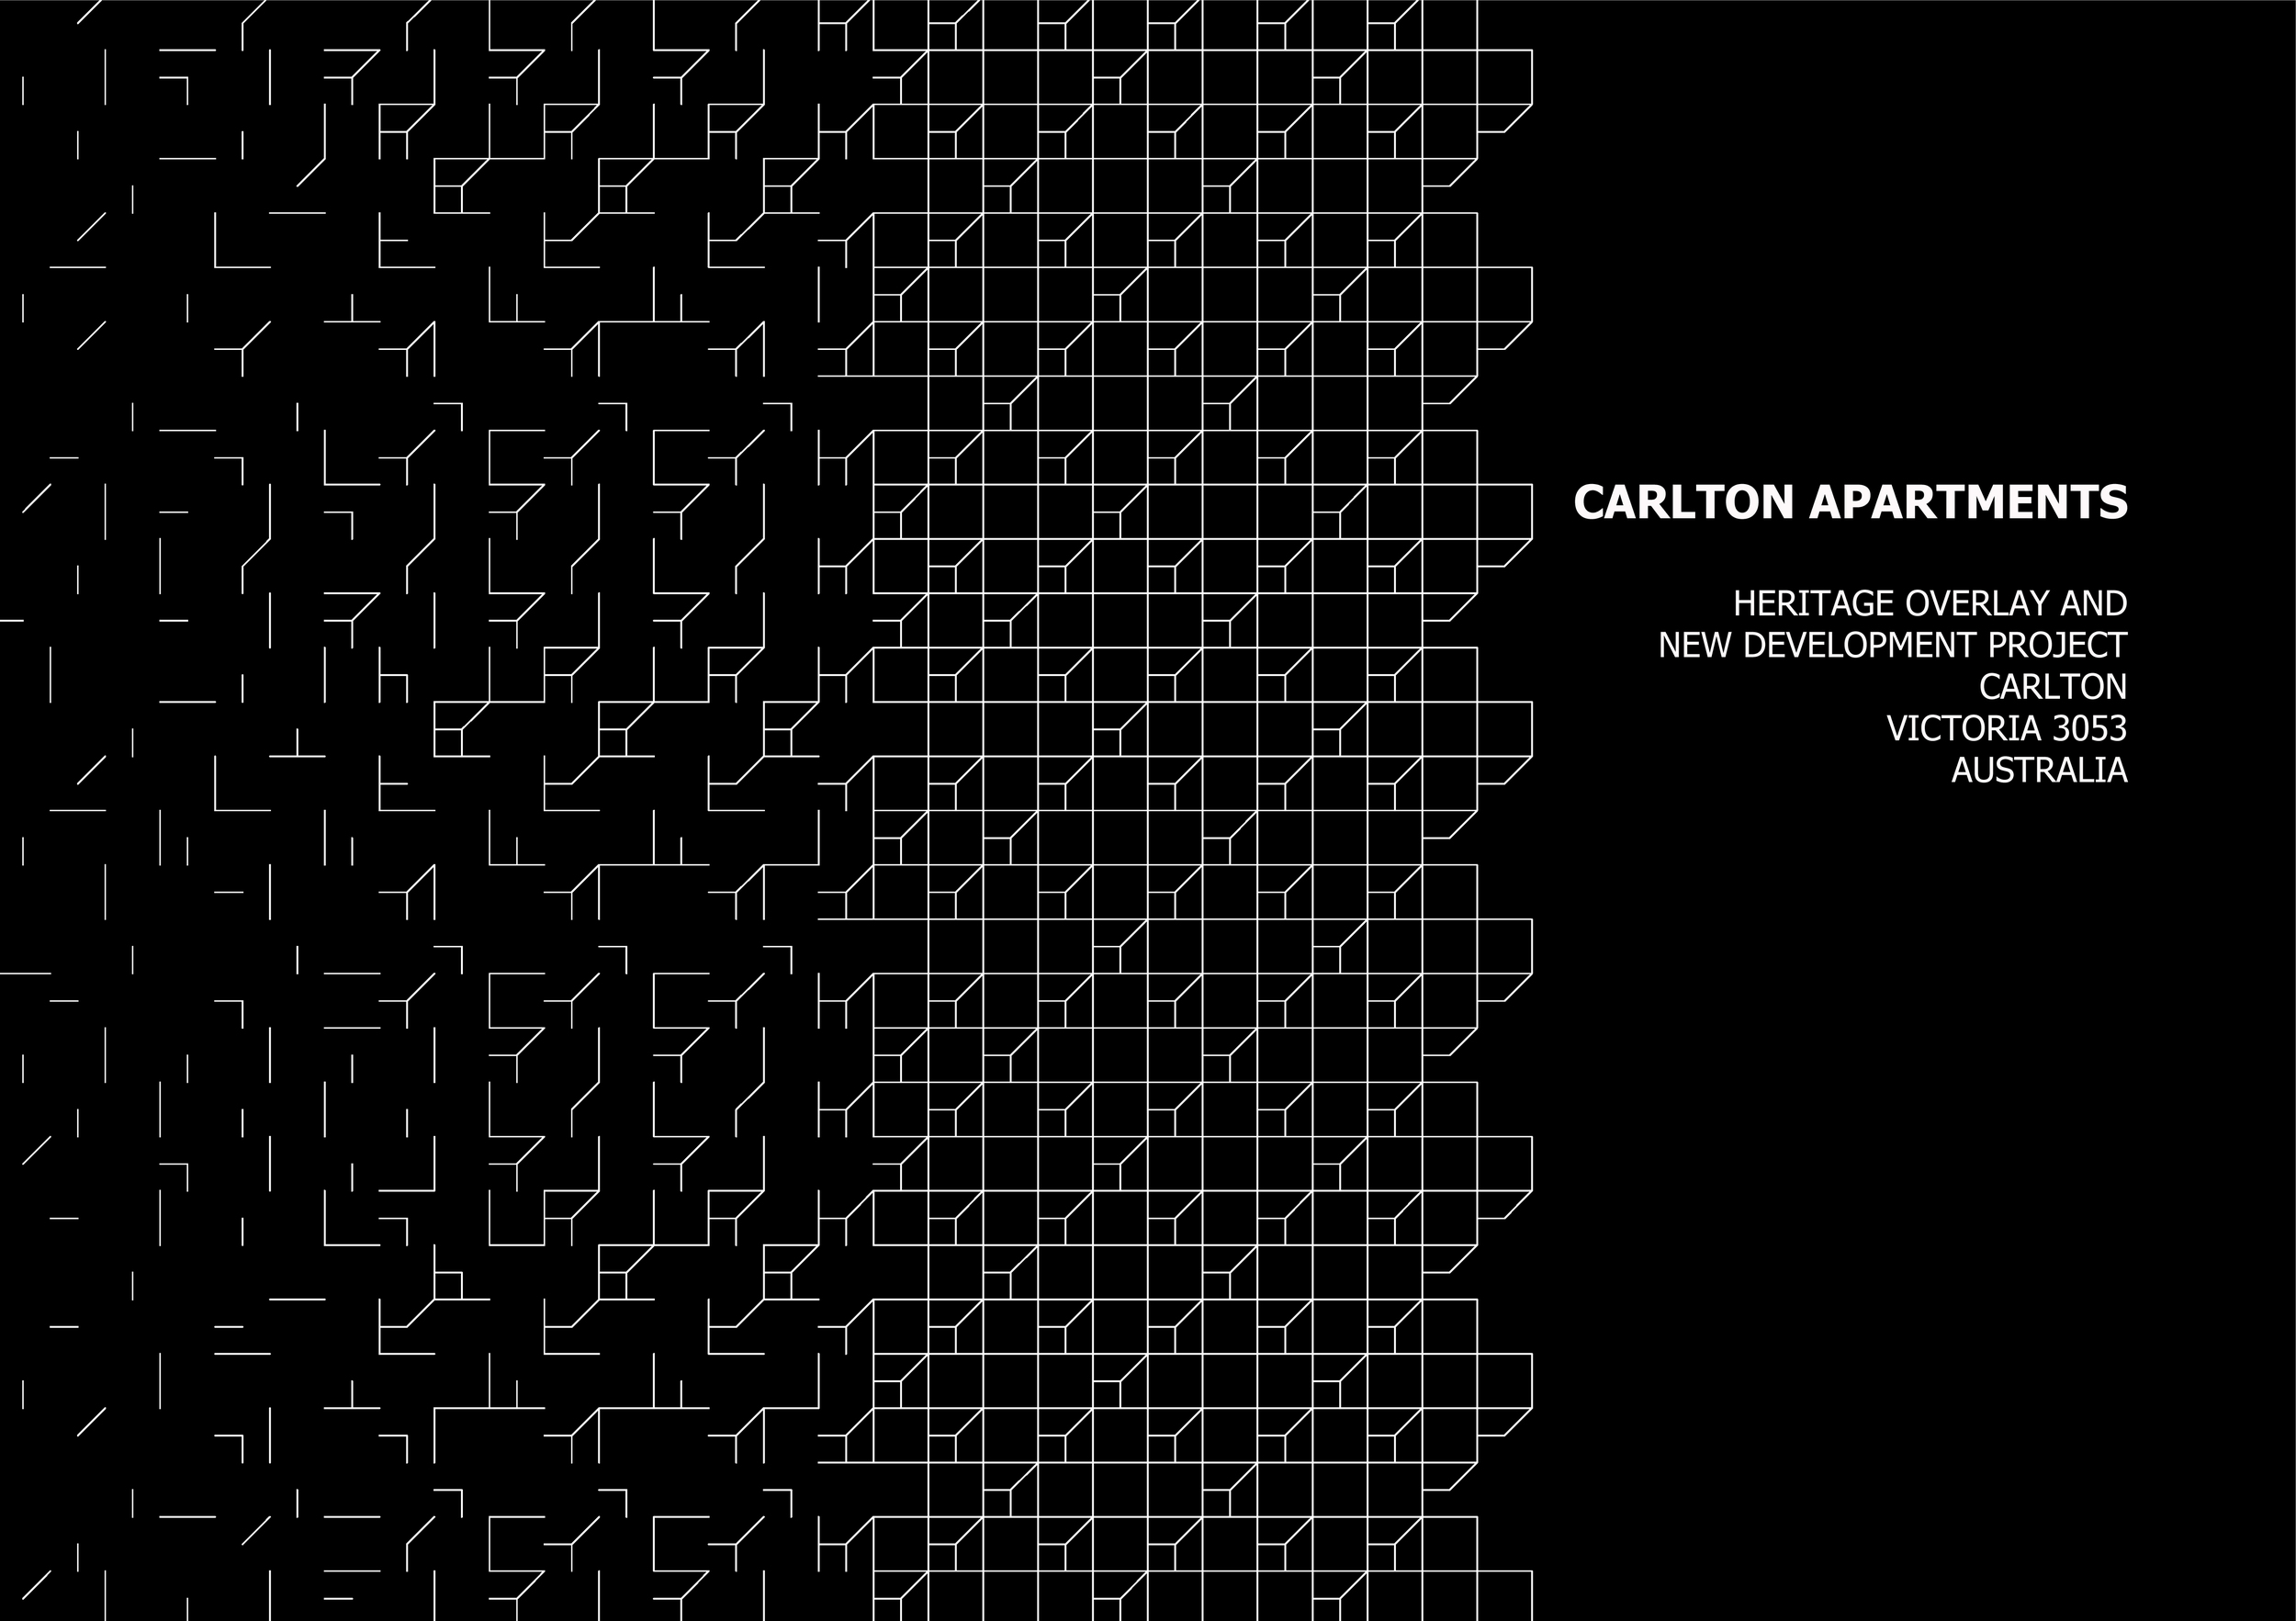 CARLTON APARTMENTS